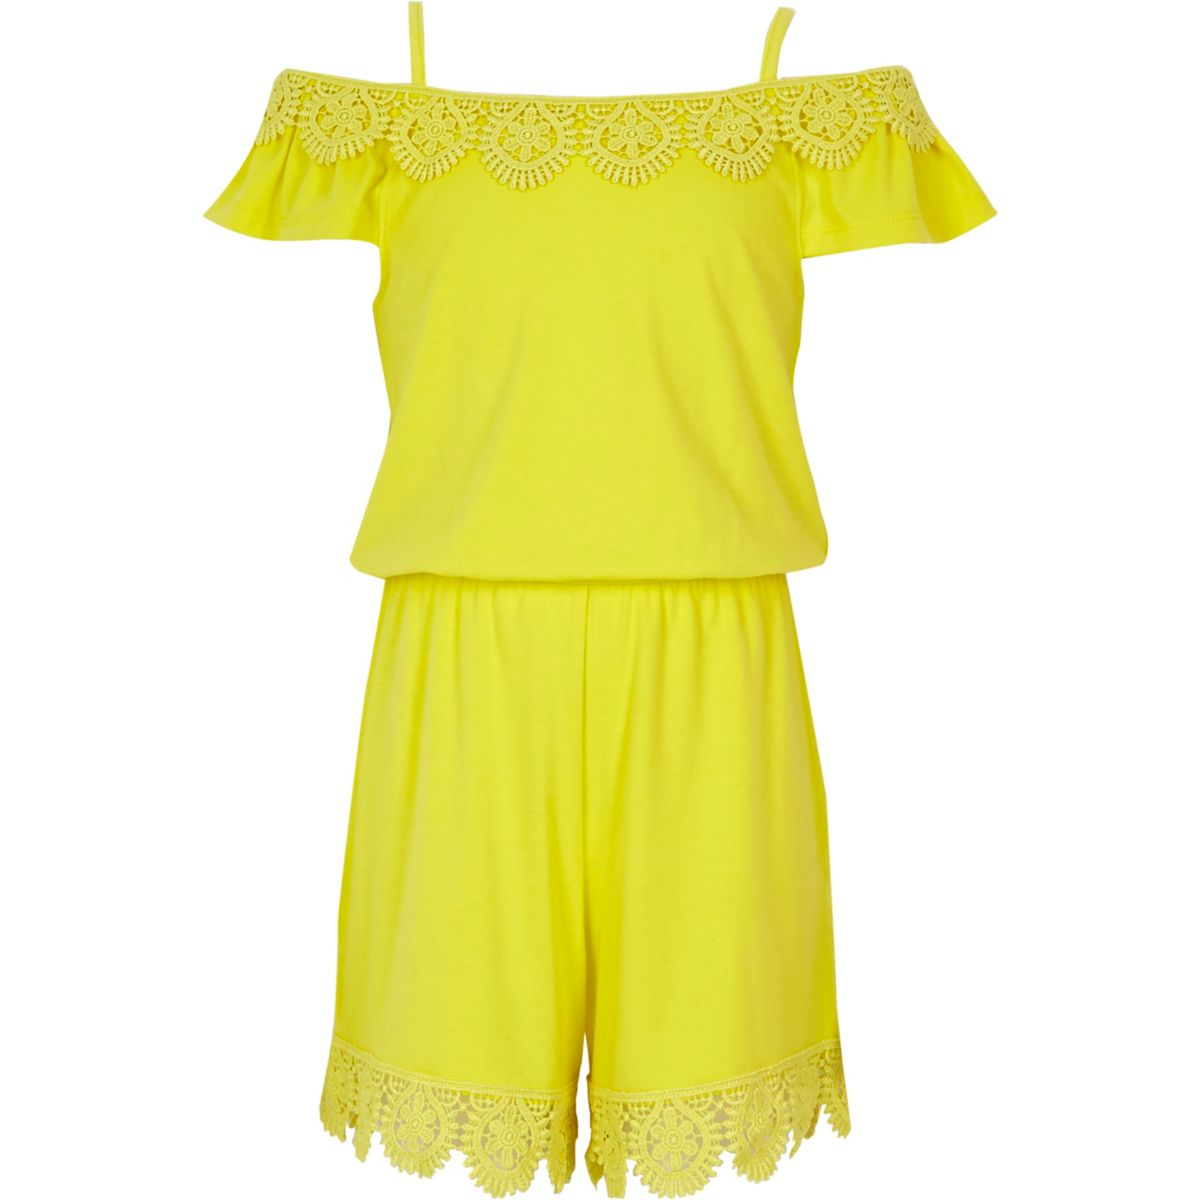 Girls yellow crochet cold shoulder romper